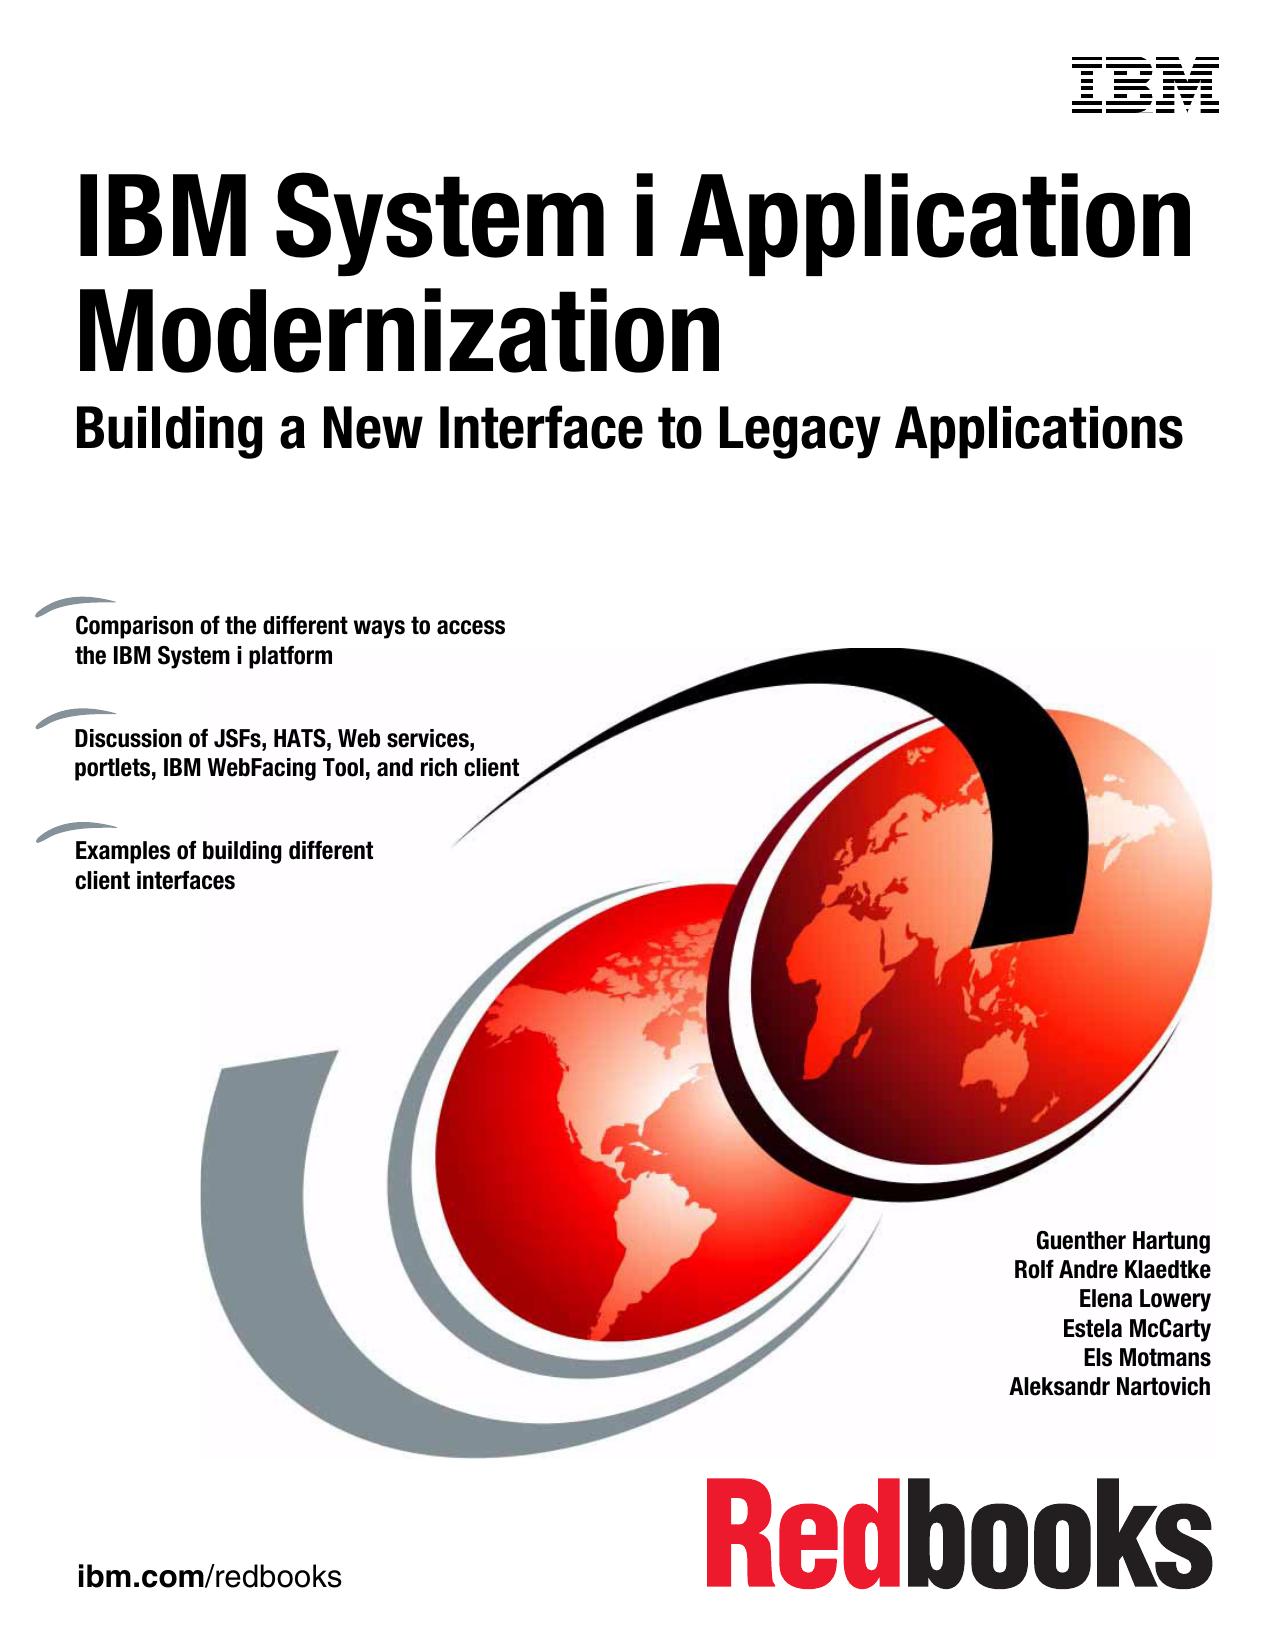 IBM System i Application Modernization: Building a New